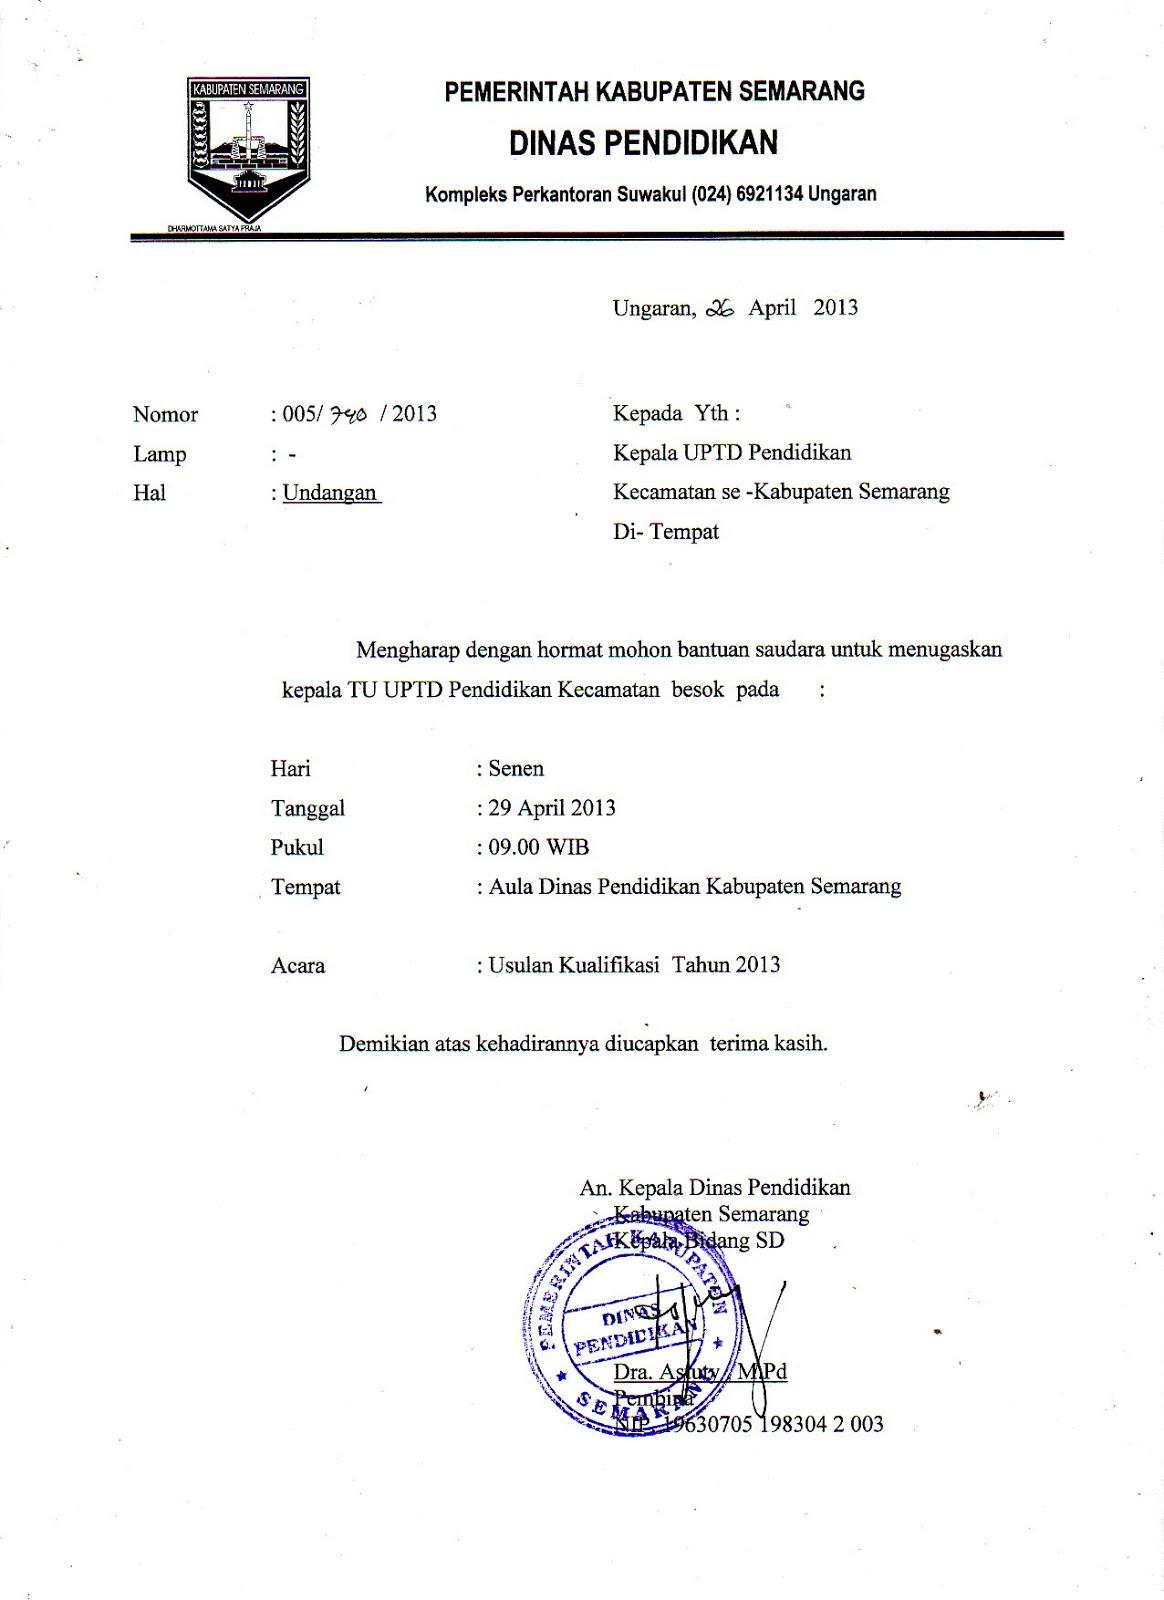 contoh thesis bahasa inggris s2